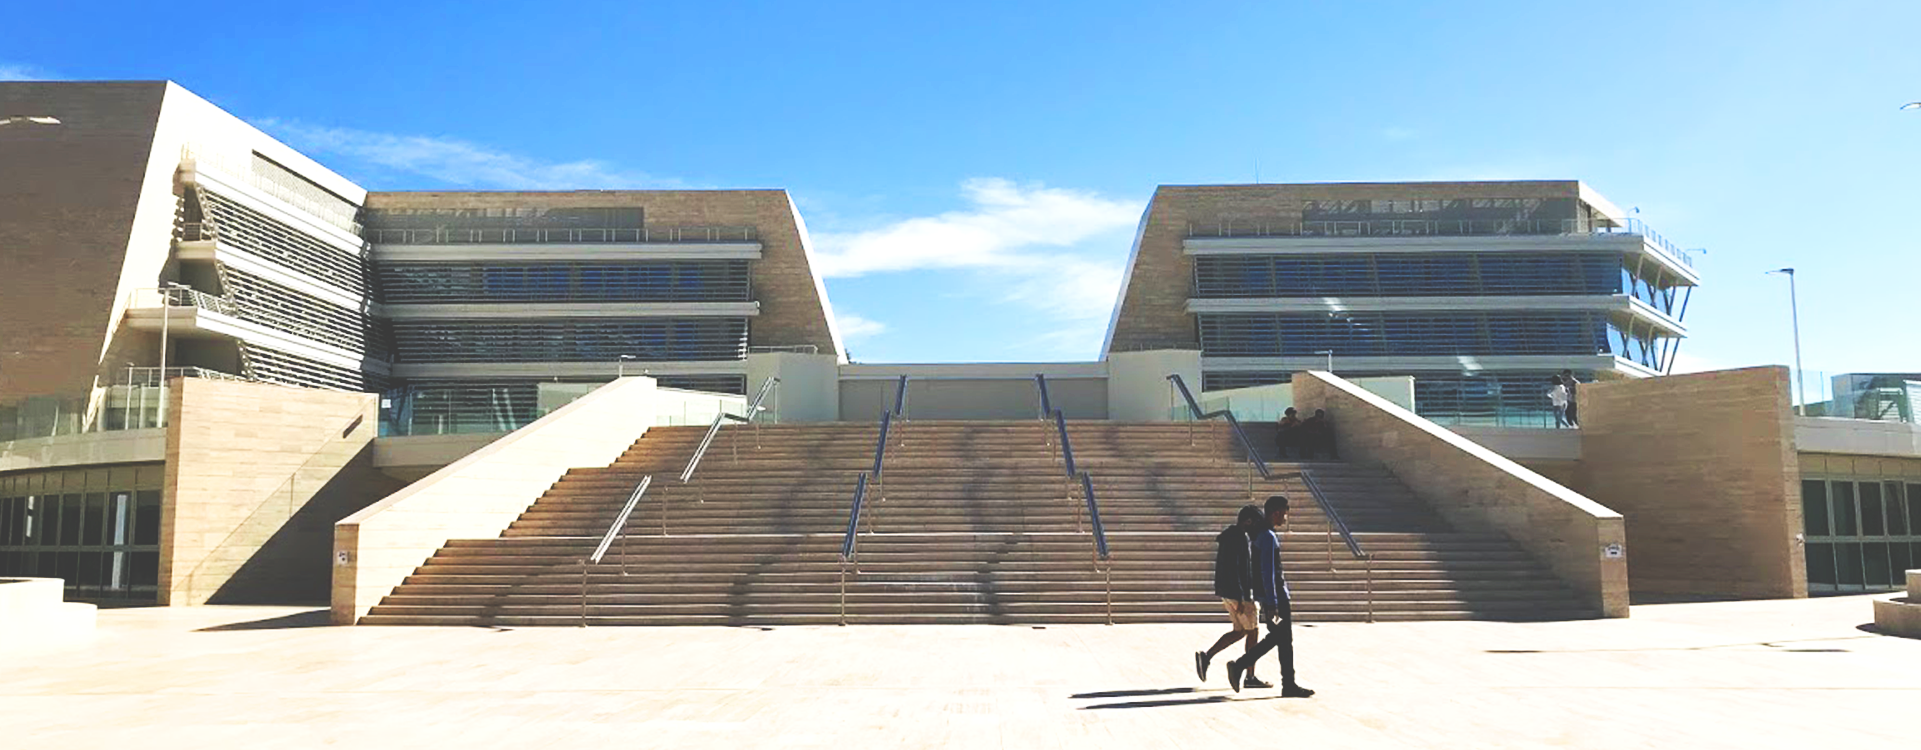 Tor Vergata University